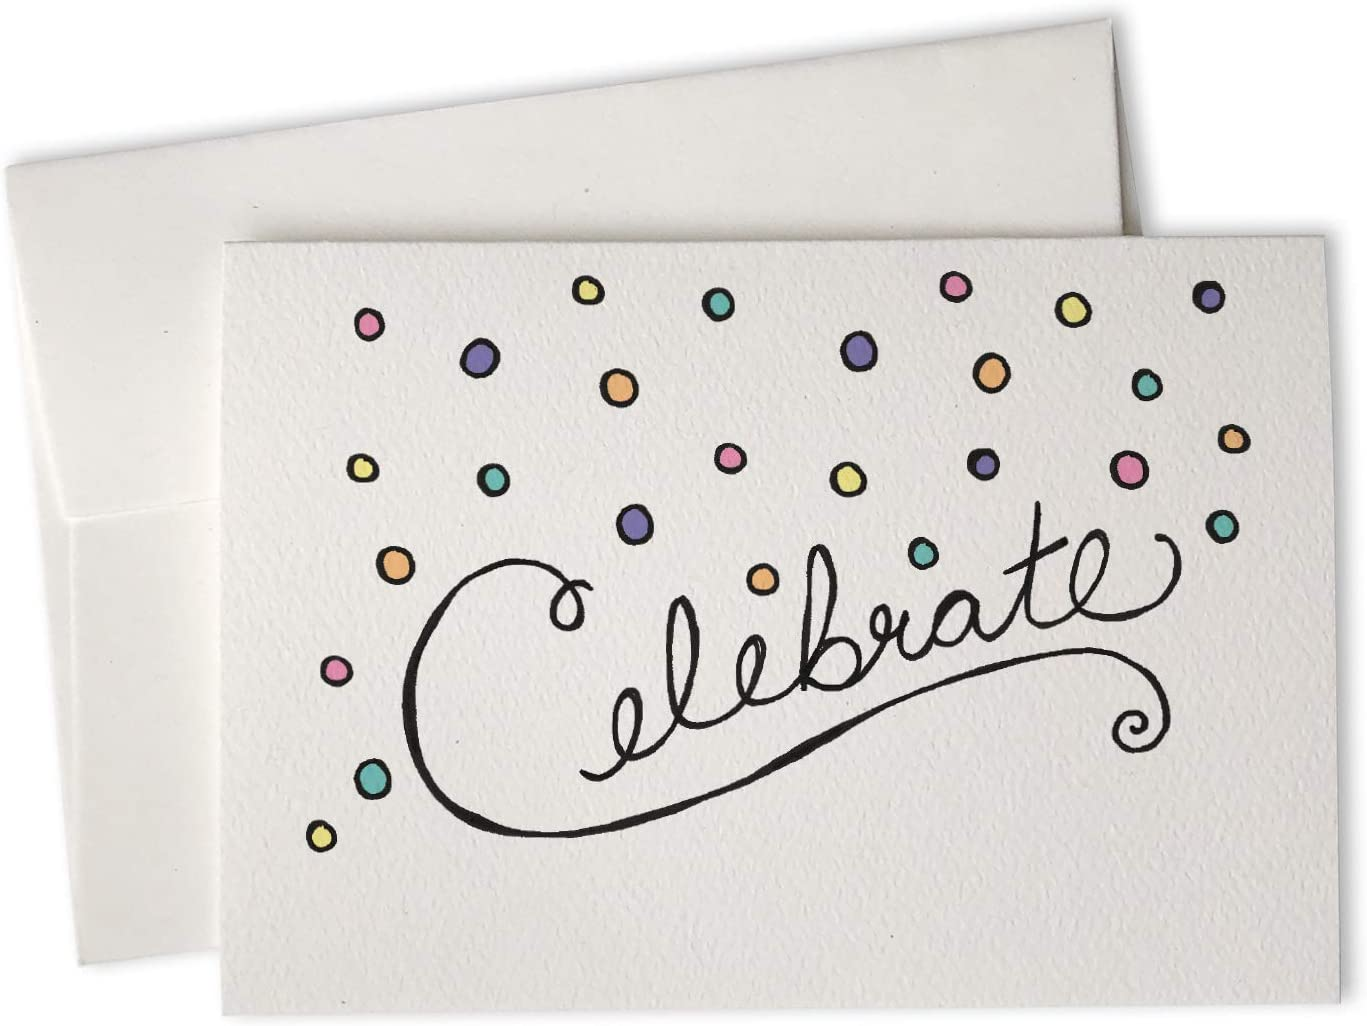 Free Confetti Unique Friend Flourish PaperCut Card Women Classic BBF Purple Blank inside Men Flourish